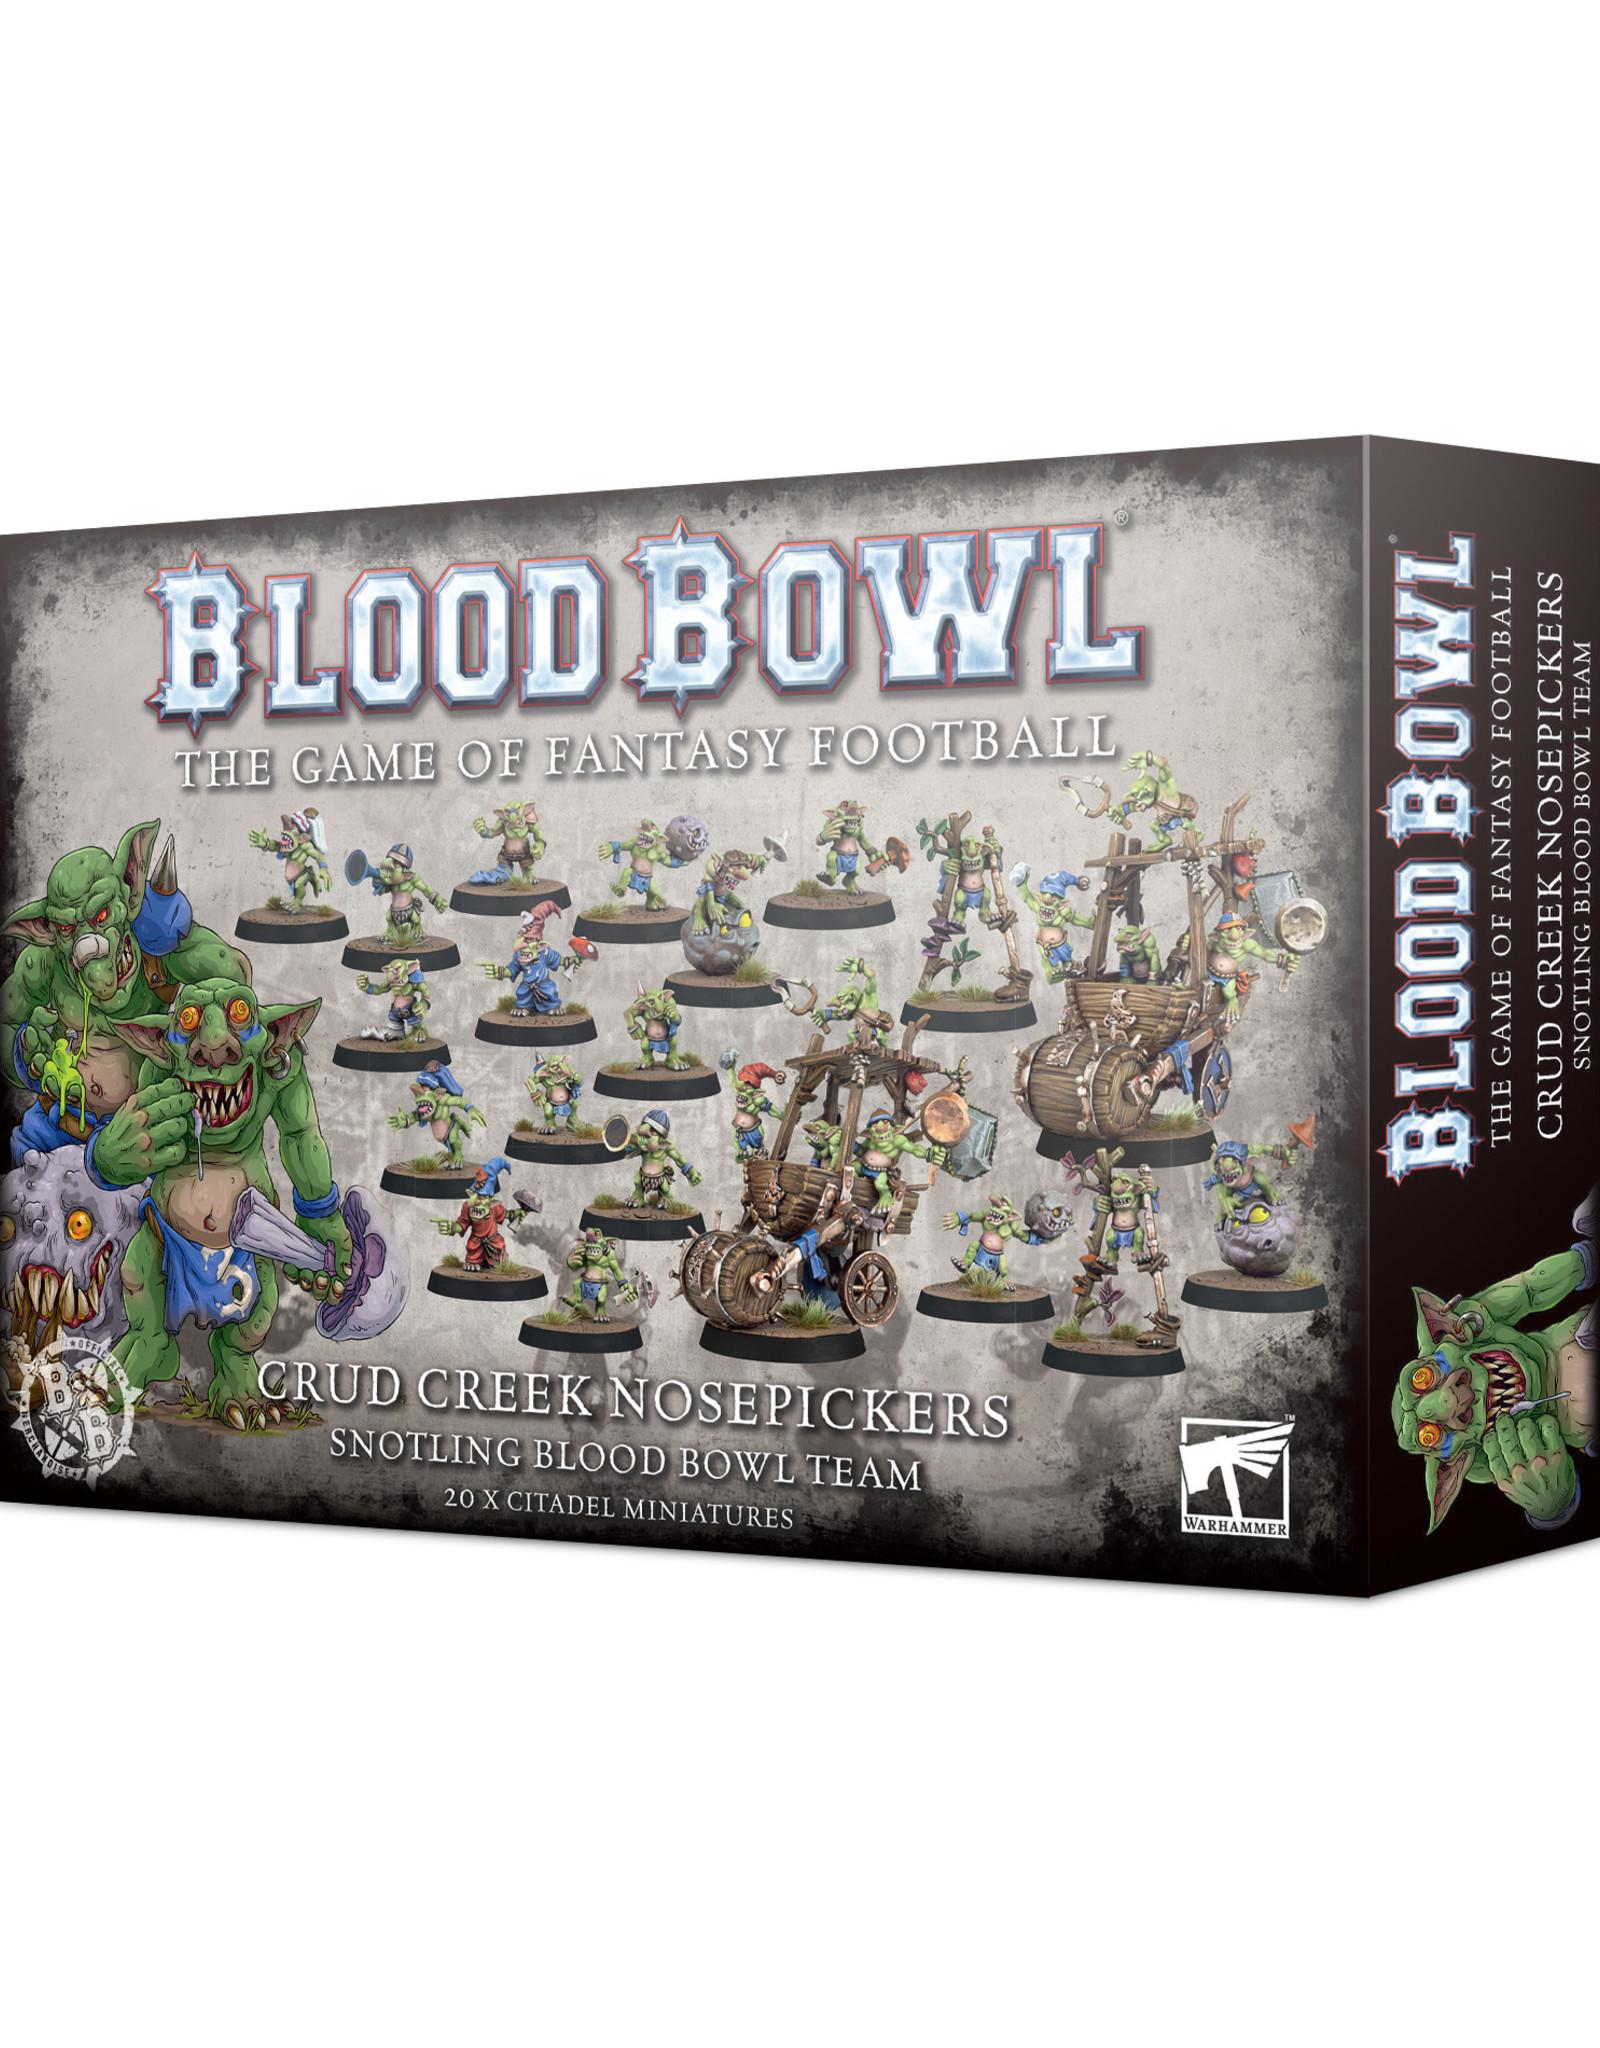 Games Workshop Blood Bowl: Crud Creek Nosepickers